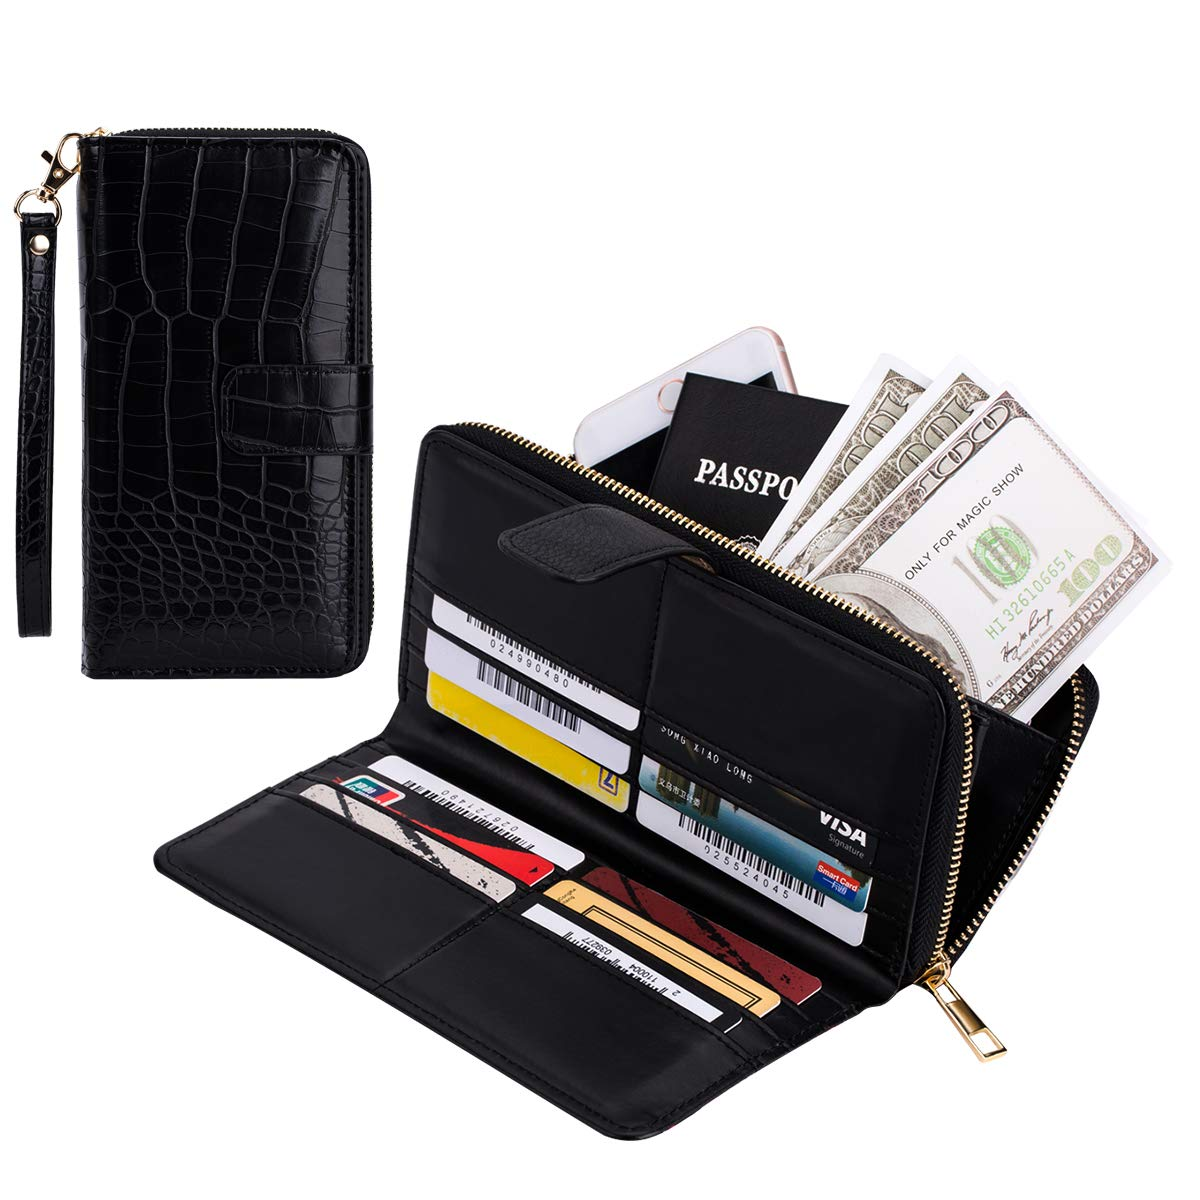 Womens Rfid Blocking Zip Around Wallet Clutch Large Capacity Travel Purse Wristlet